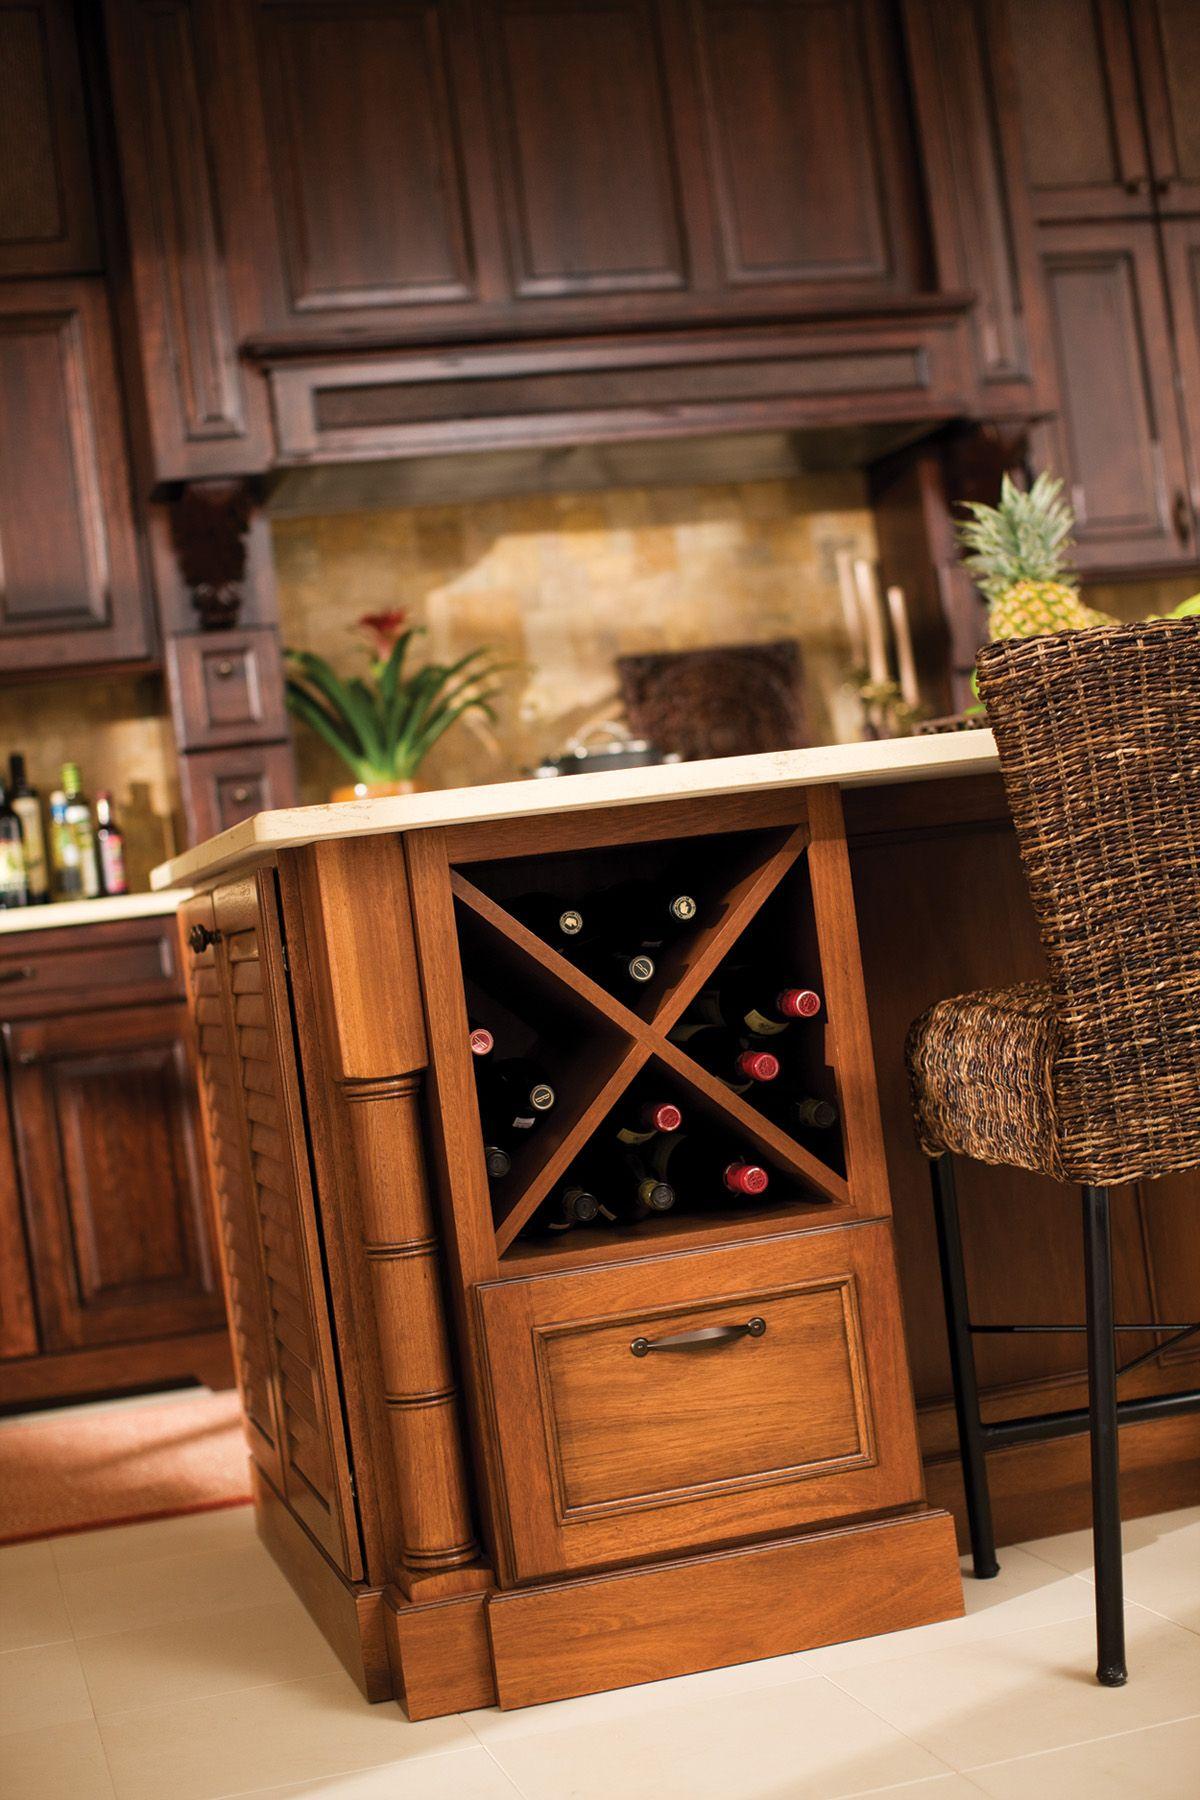 Storage Dura Supreme Cabinetry Tropical Kitchen Wine Rack Design Modern Wine Rack Kitchen islands with wine racks